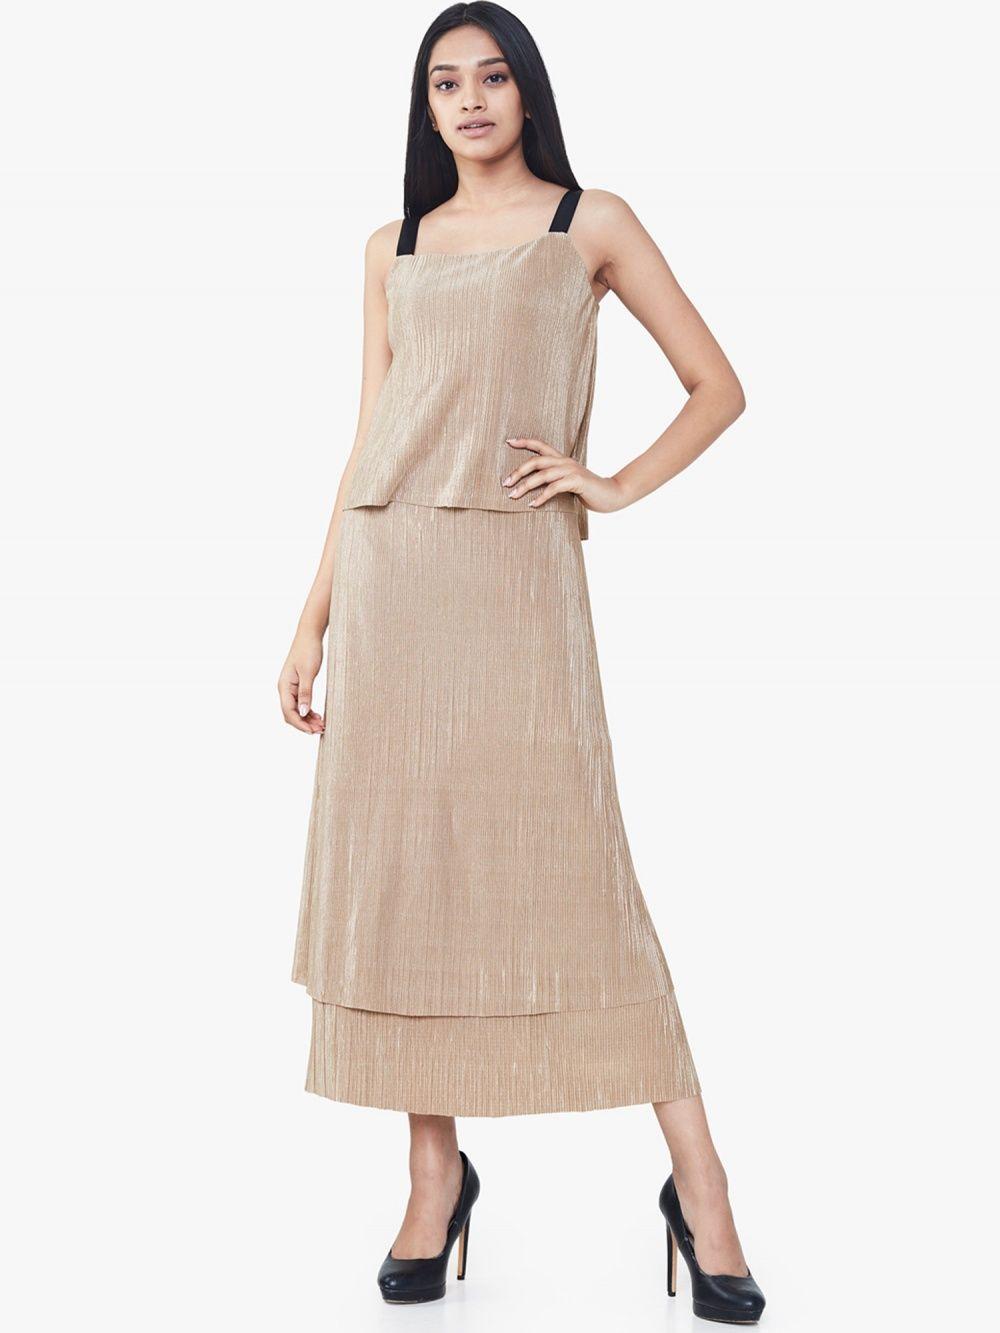 And Metallic Knit Tiered Maxi Dress